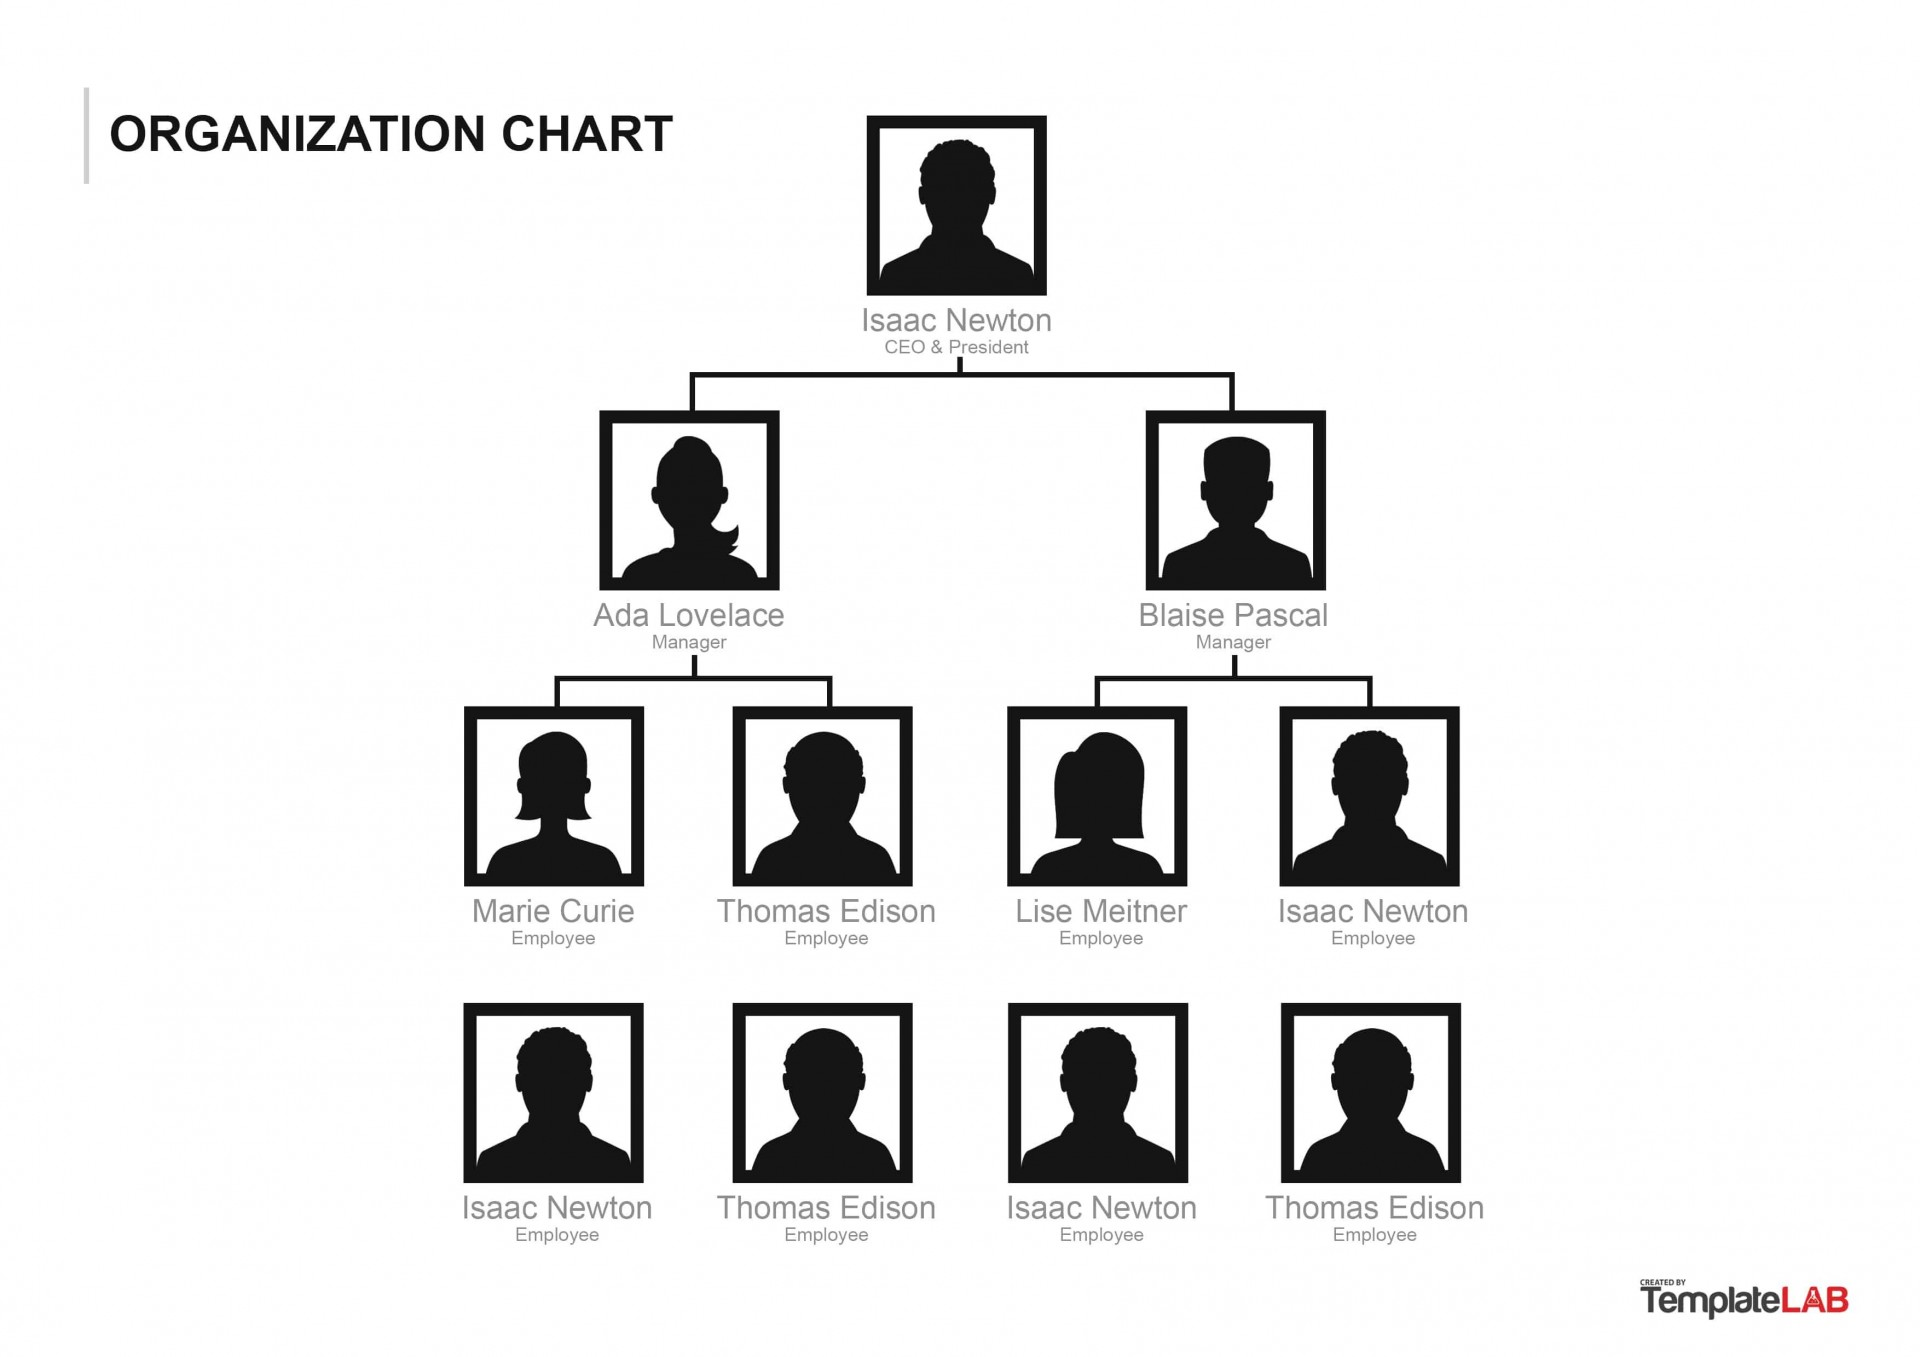 009 Stunning Free Organizational Chart Template Excel 2010 Inspiration 1920